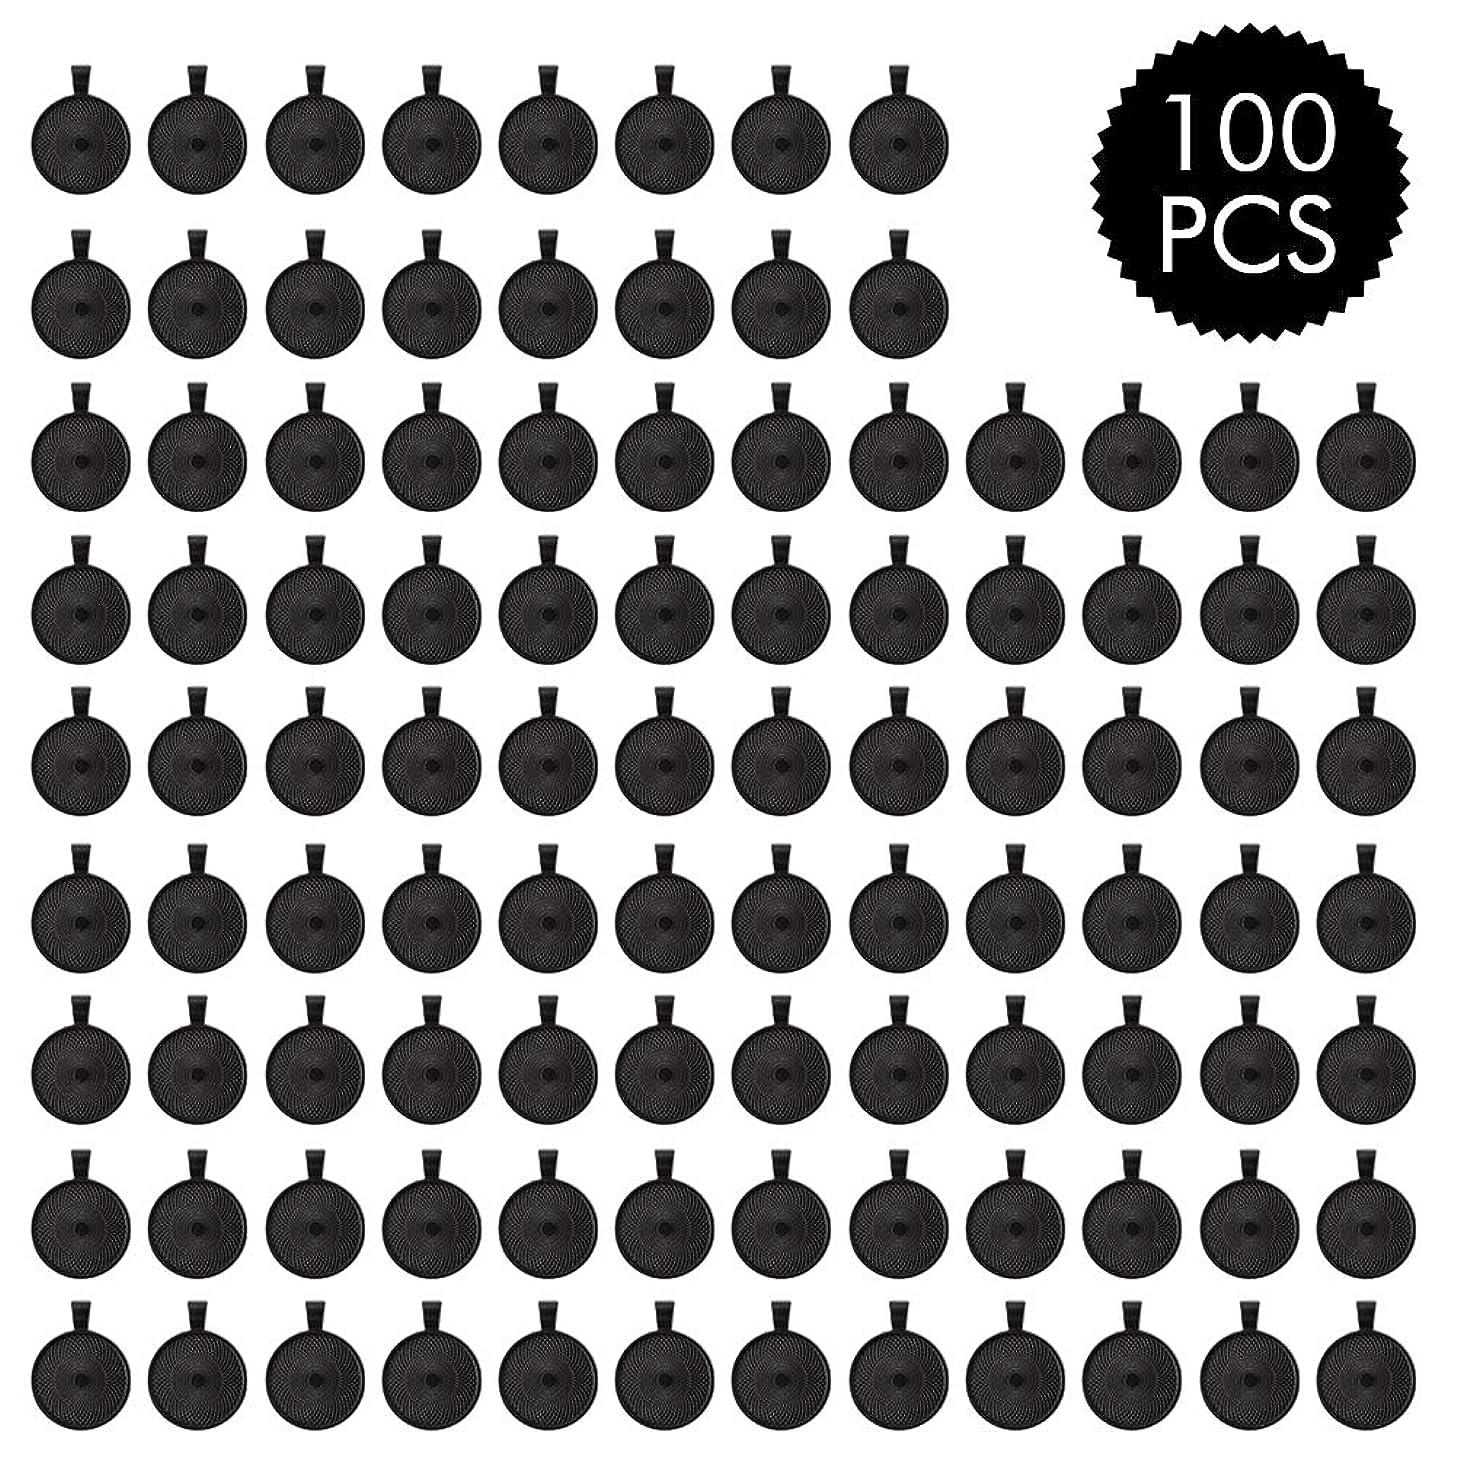 ASIBT 100 PCS Bezel Pendant Trays Round Cabochon Settings Trays Pendant Blanks, 25mm Diameter (Black)